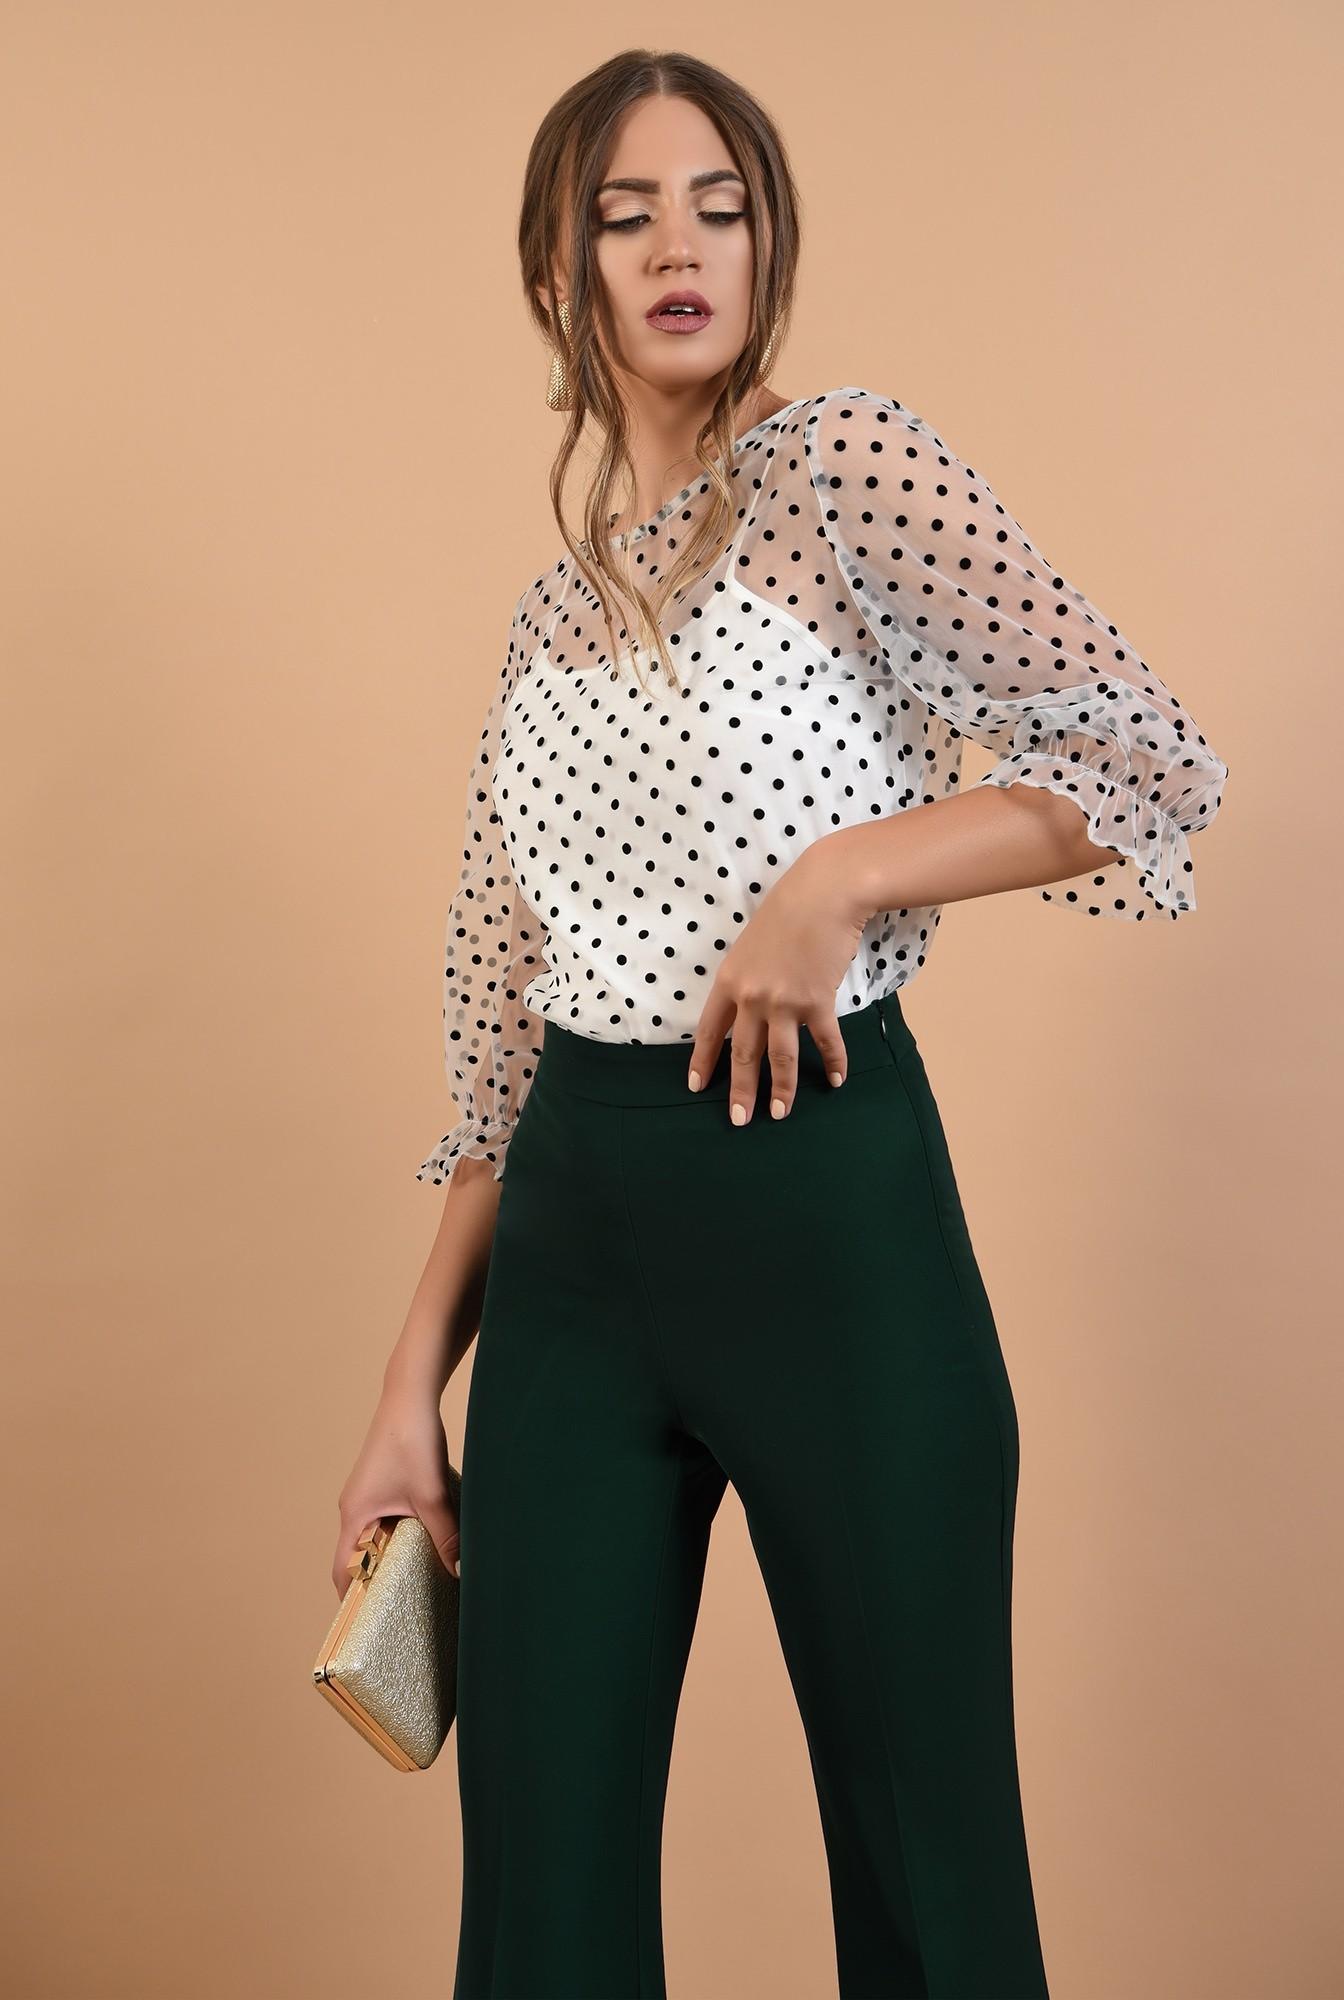 0 - 360 - pantaloni evazati, lungi, croi la dunga, verde inchis, Poema